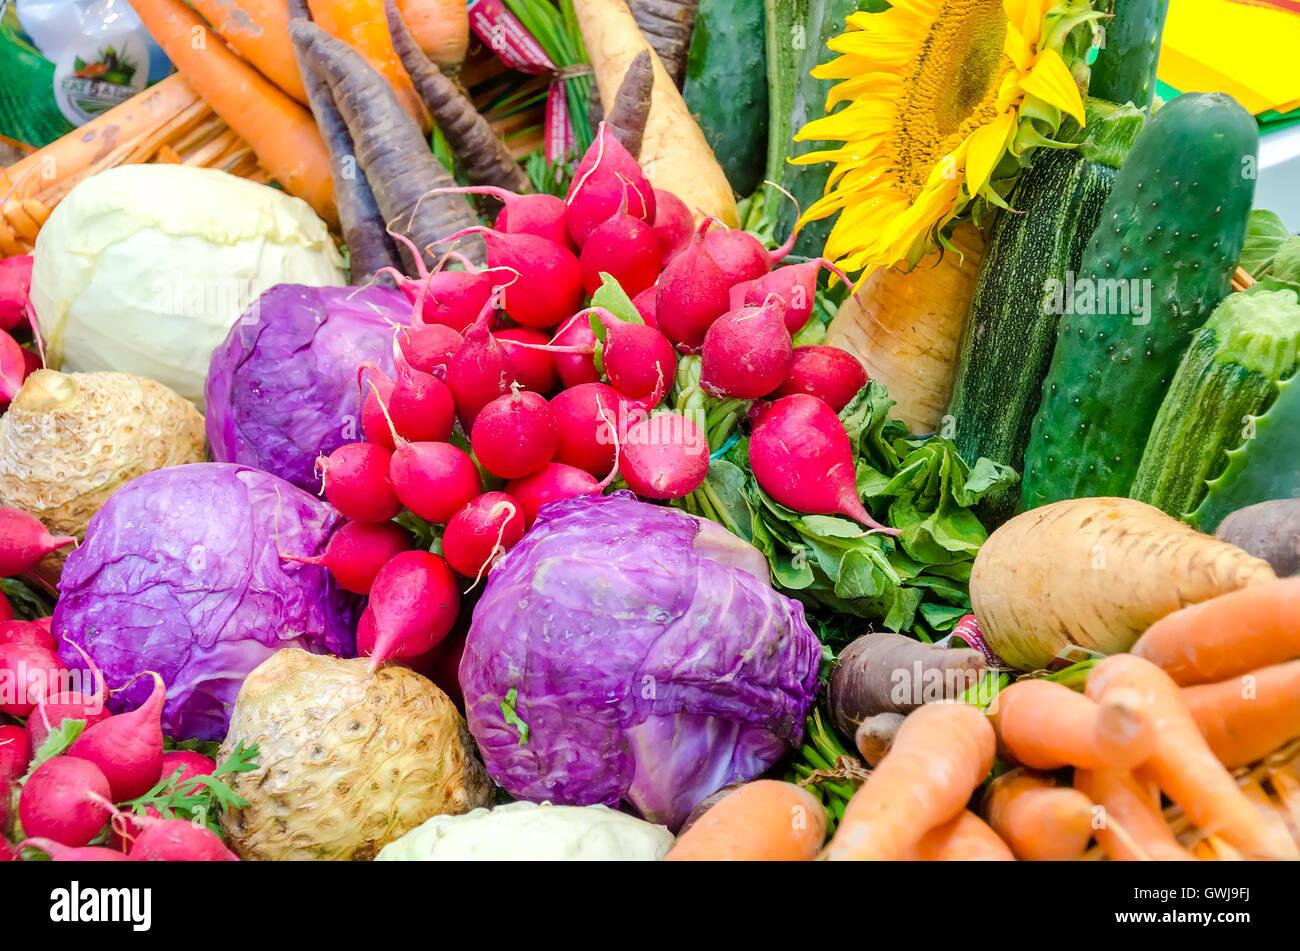 Rosa Rettich Sorte Gemüse Vegan Hintergrund Stockbild